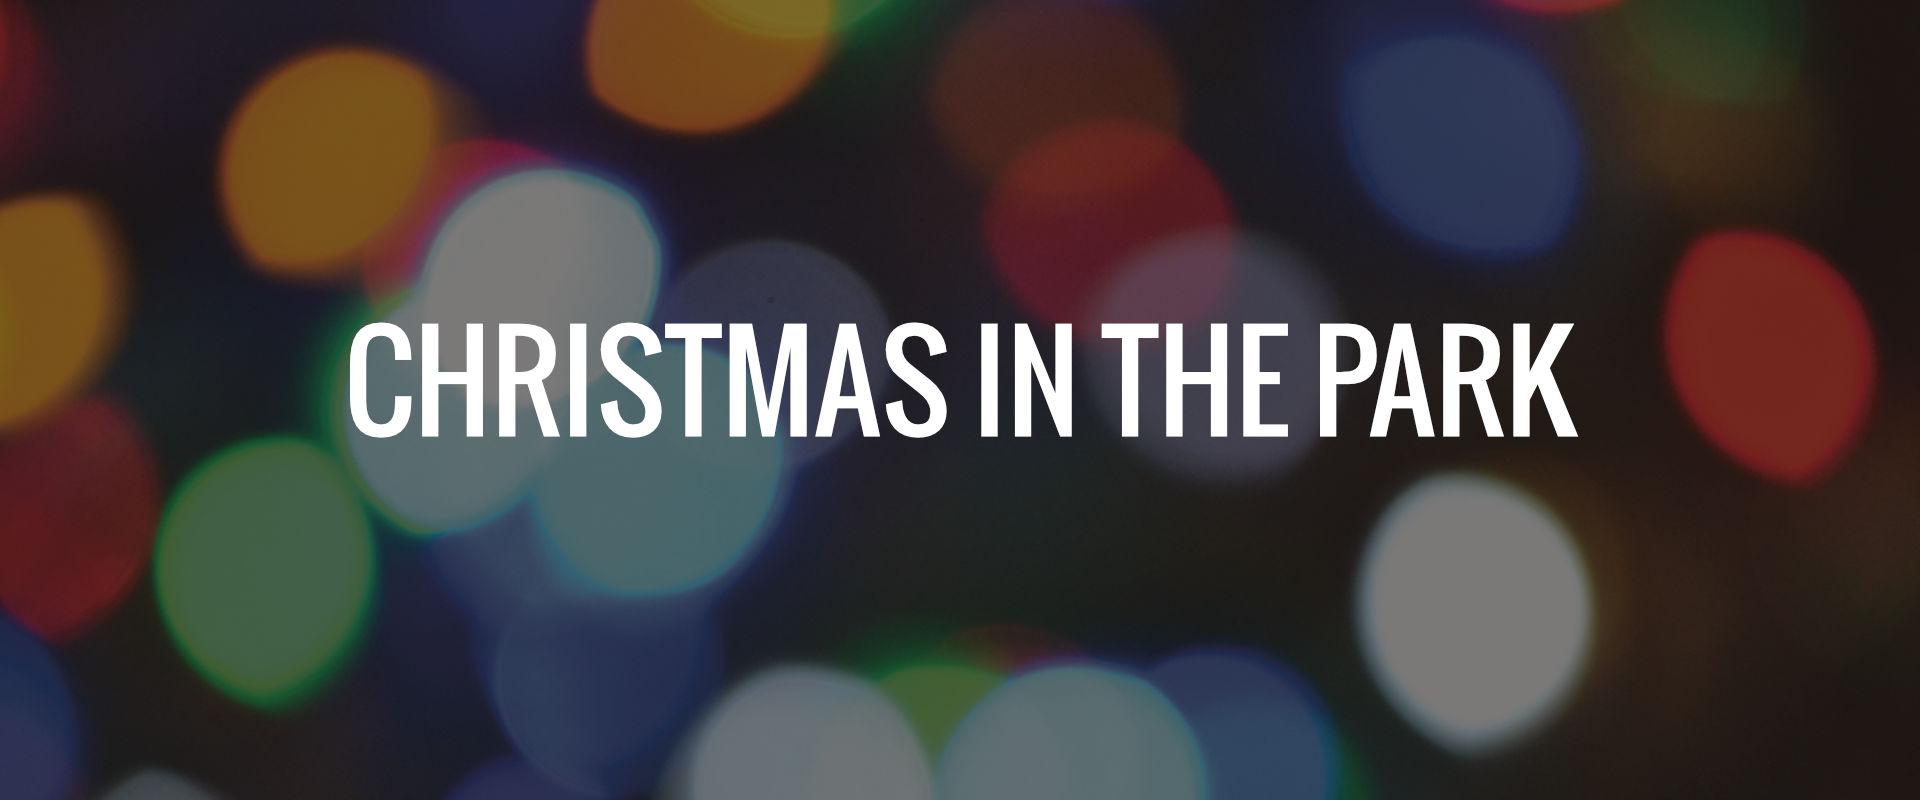 Slide_Christmas_in_the_Park_1920x800